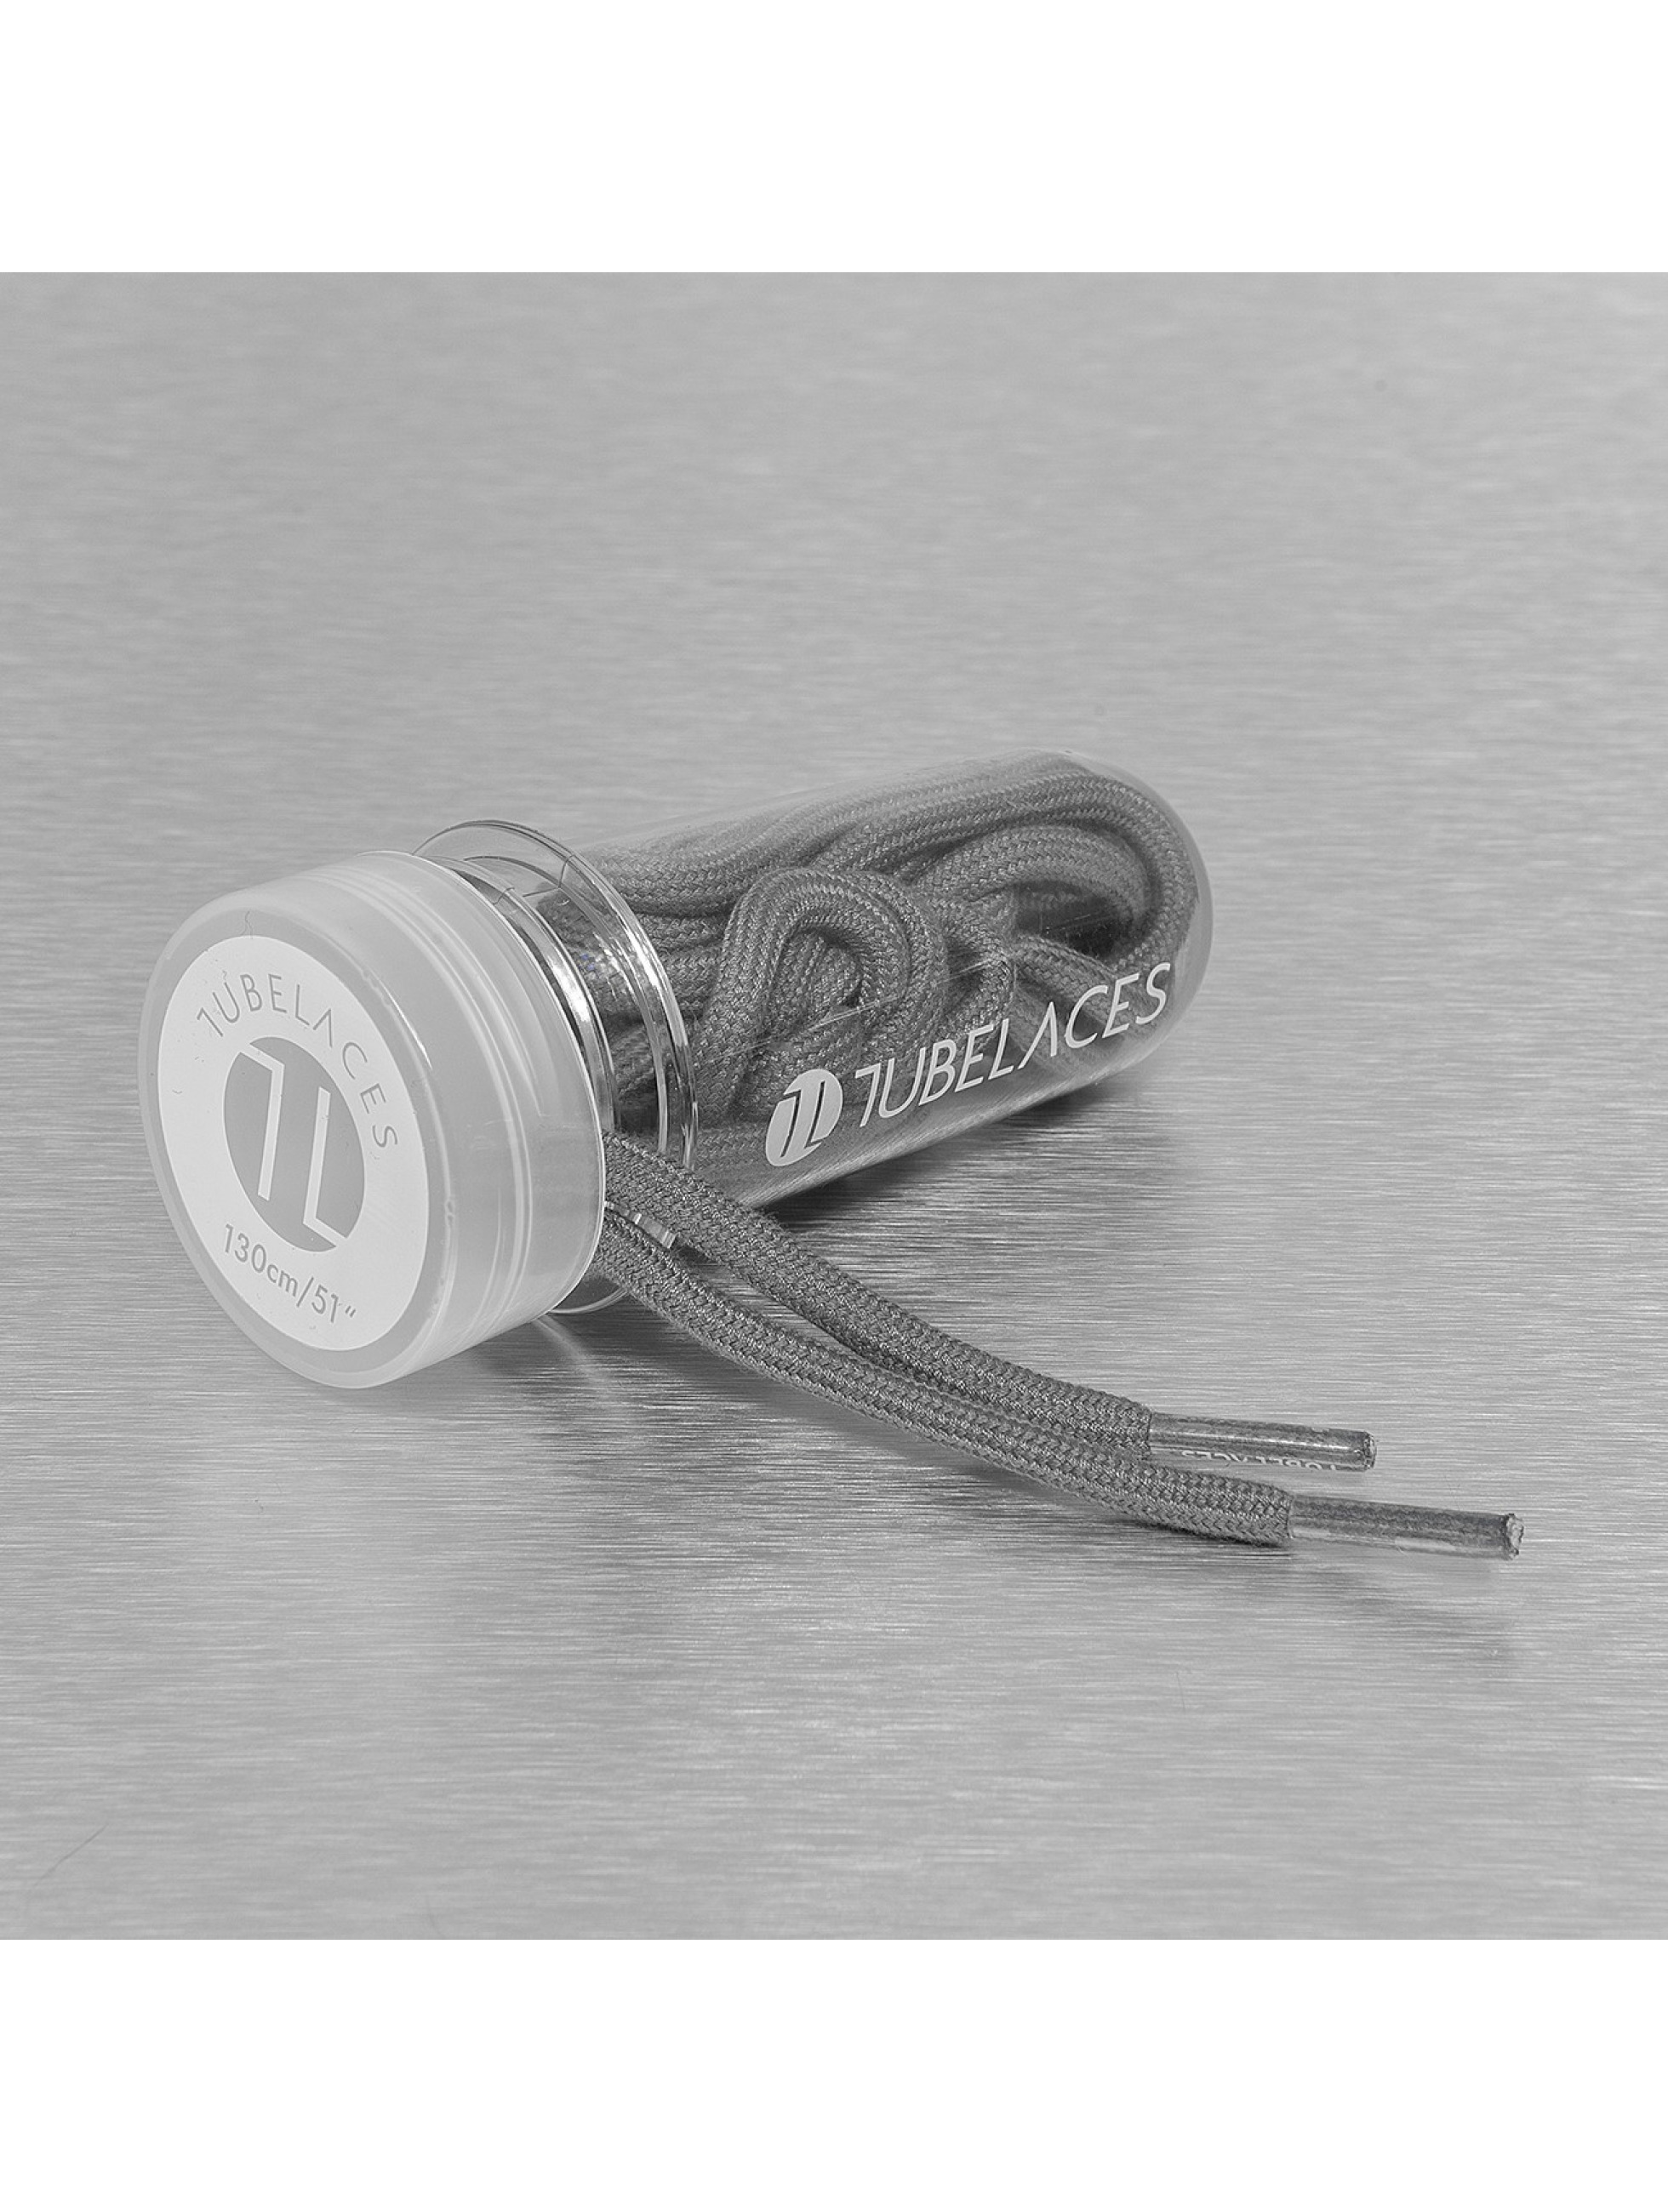 Tubelaces Schuhzubehör Rope Solid grau